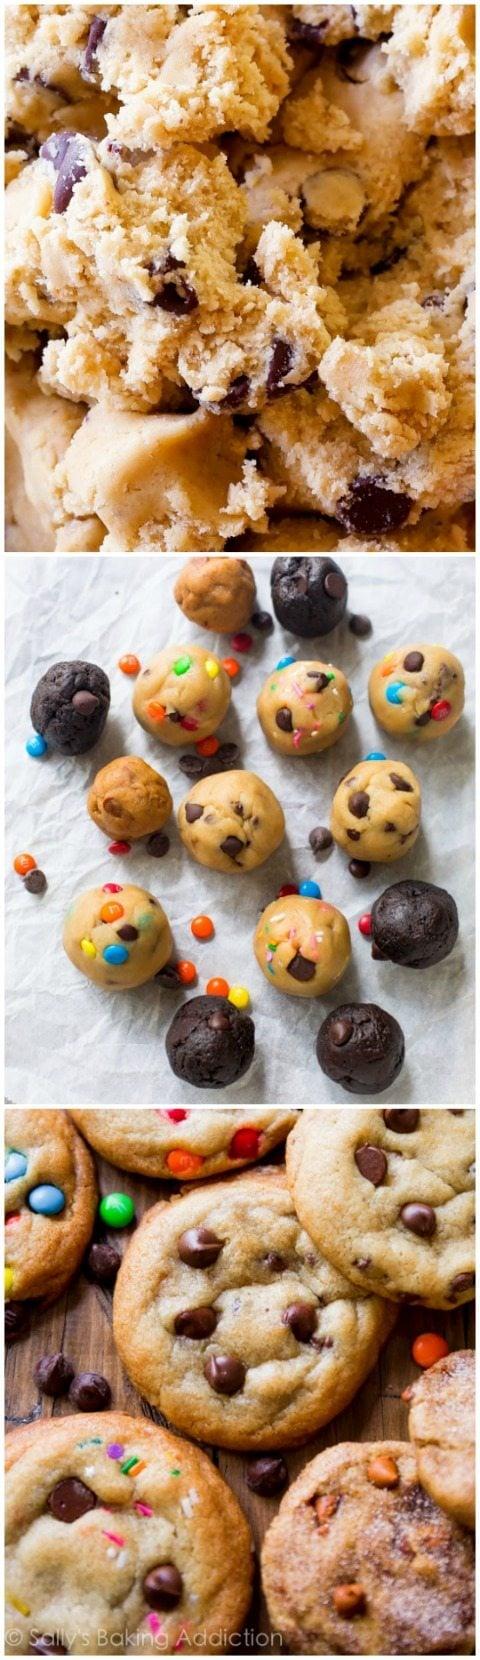 How to Freeze Cookie Dough - Sallys Baking Addiction